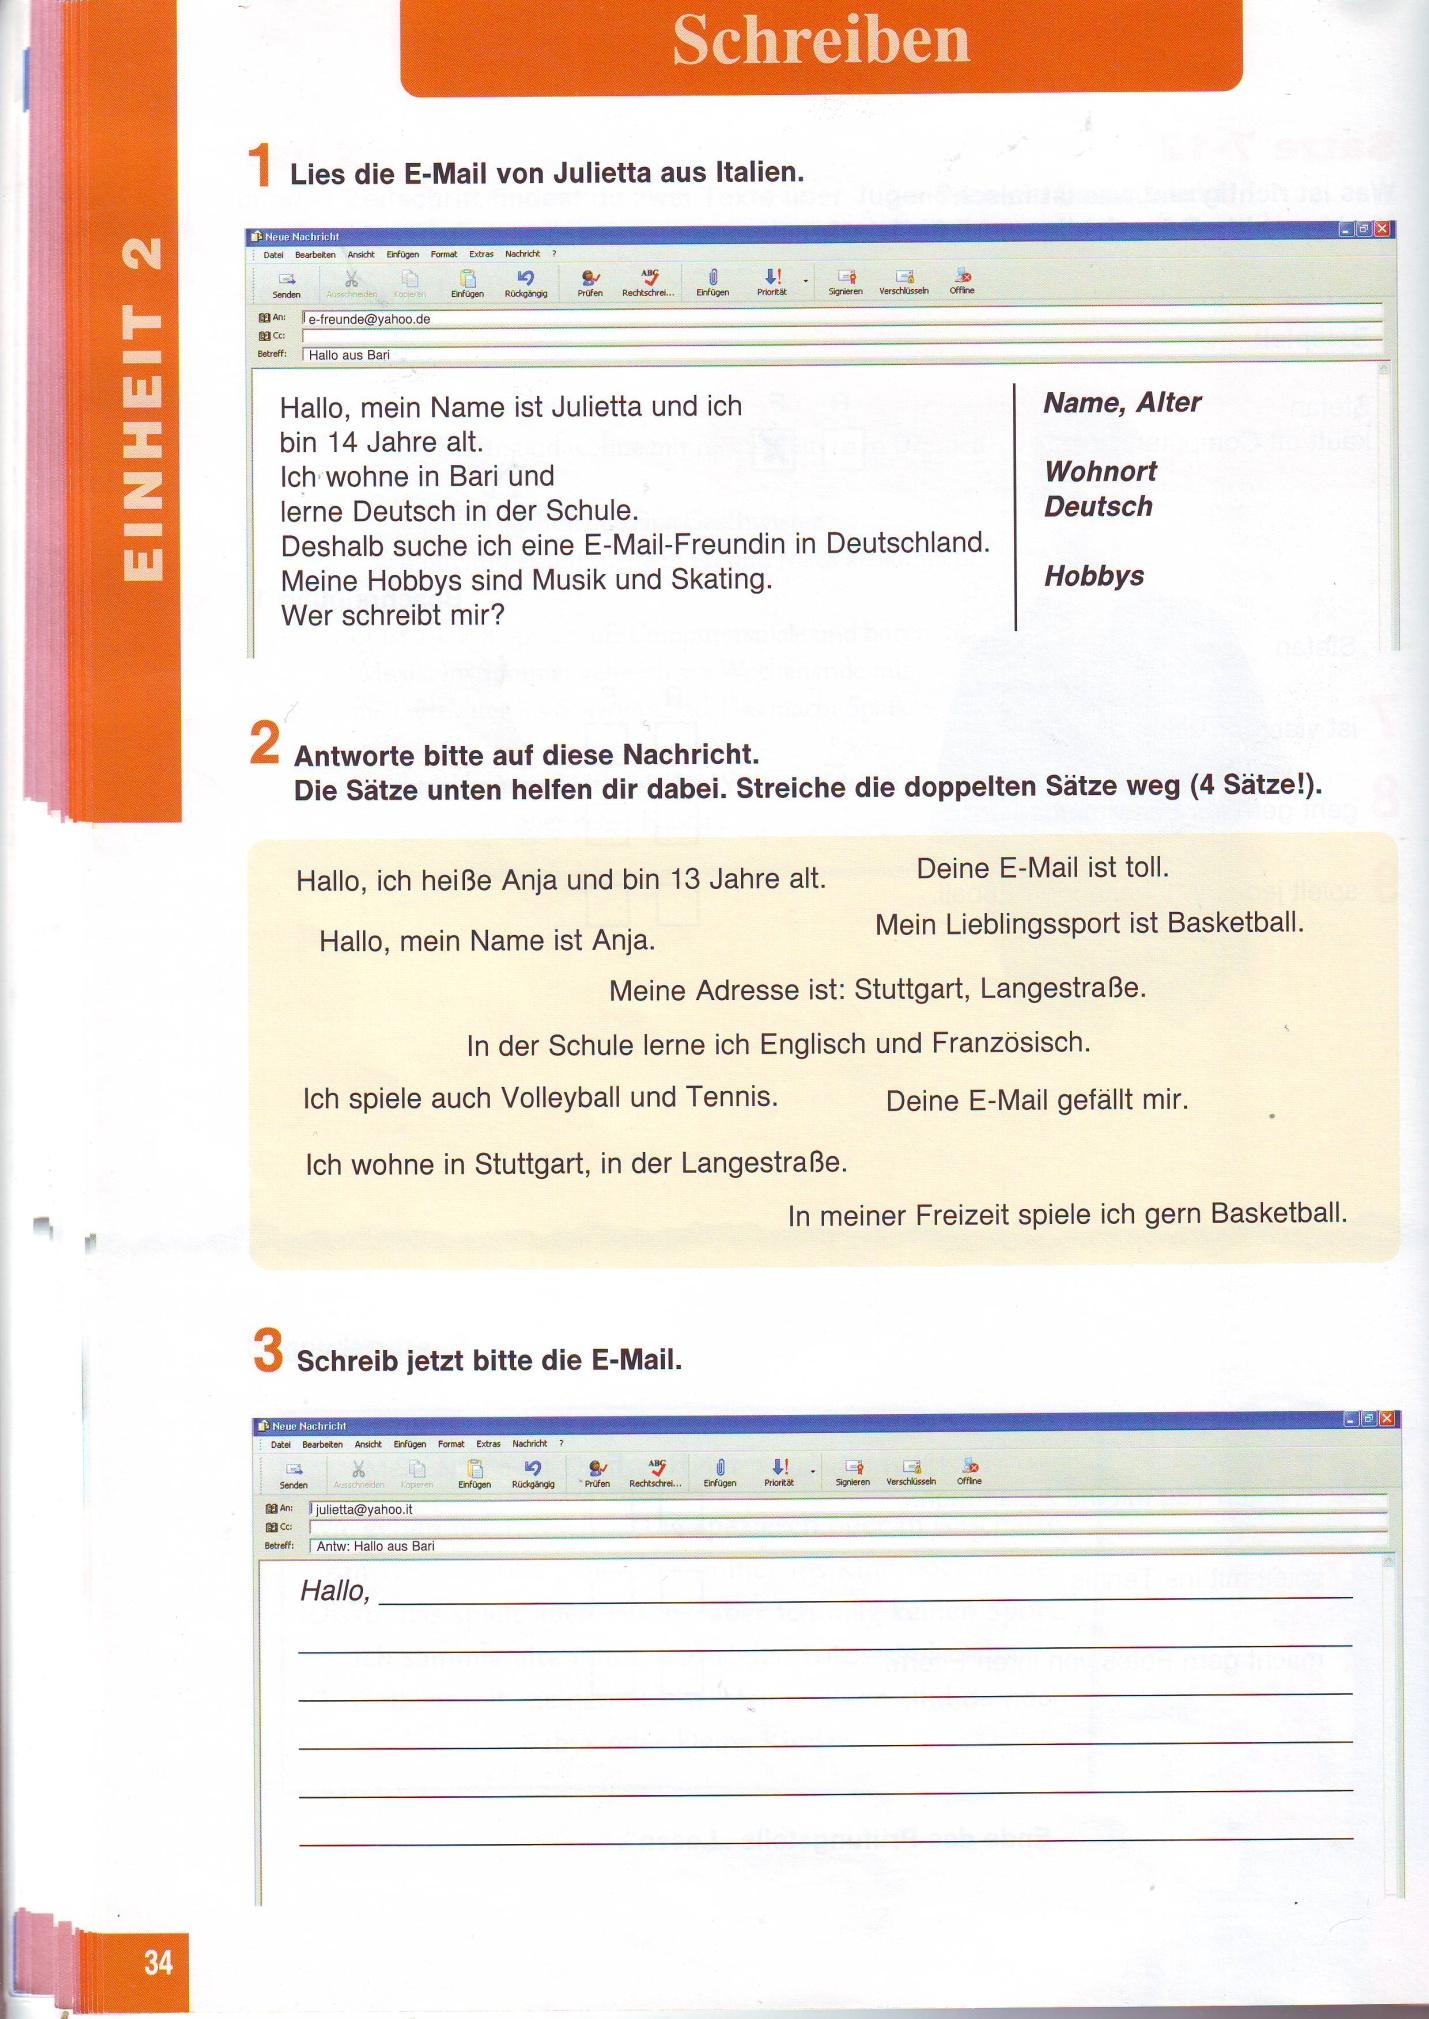 C:\Documents and Settings\TEMP\Рабочий стол\немецкий\фит ин дойч\фит ин дойч 1\Image0082.JPG